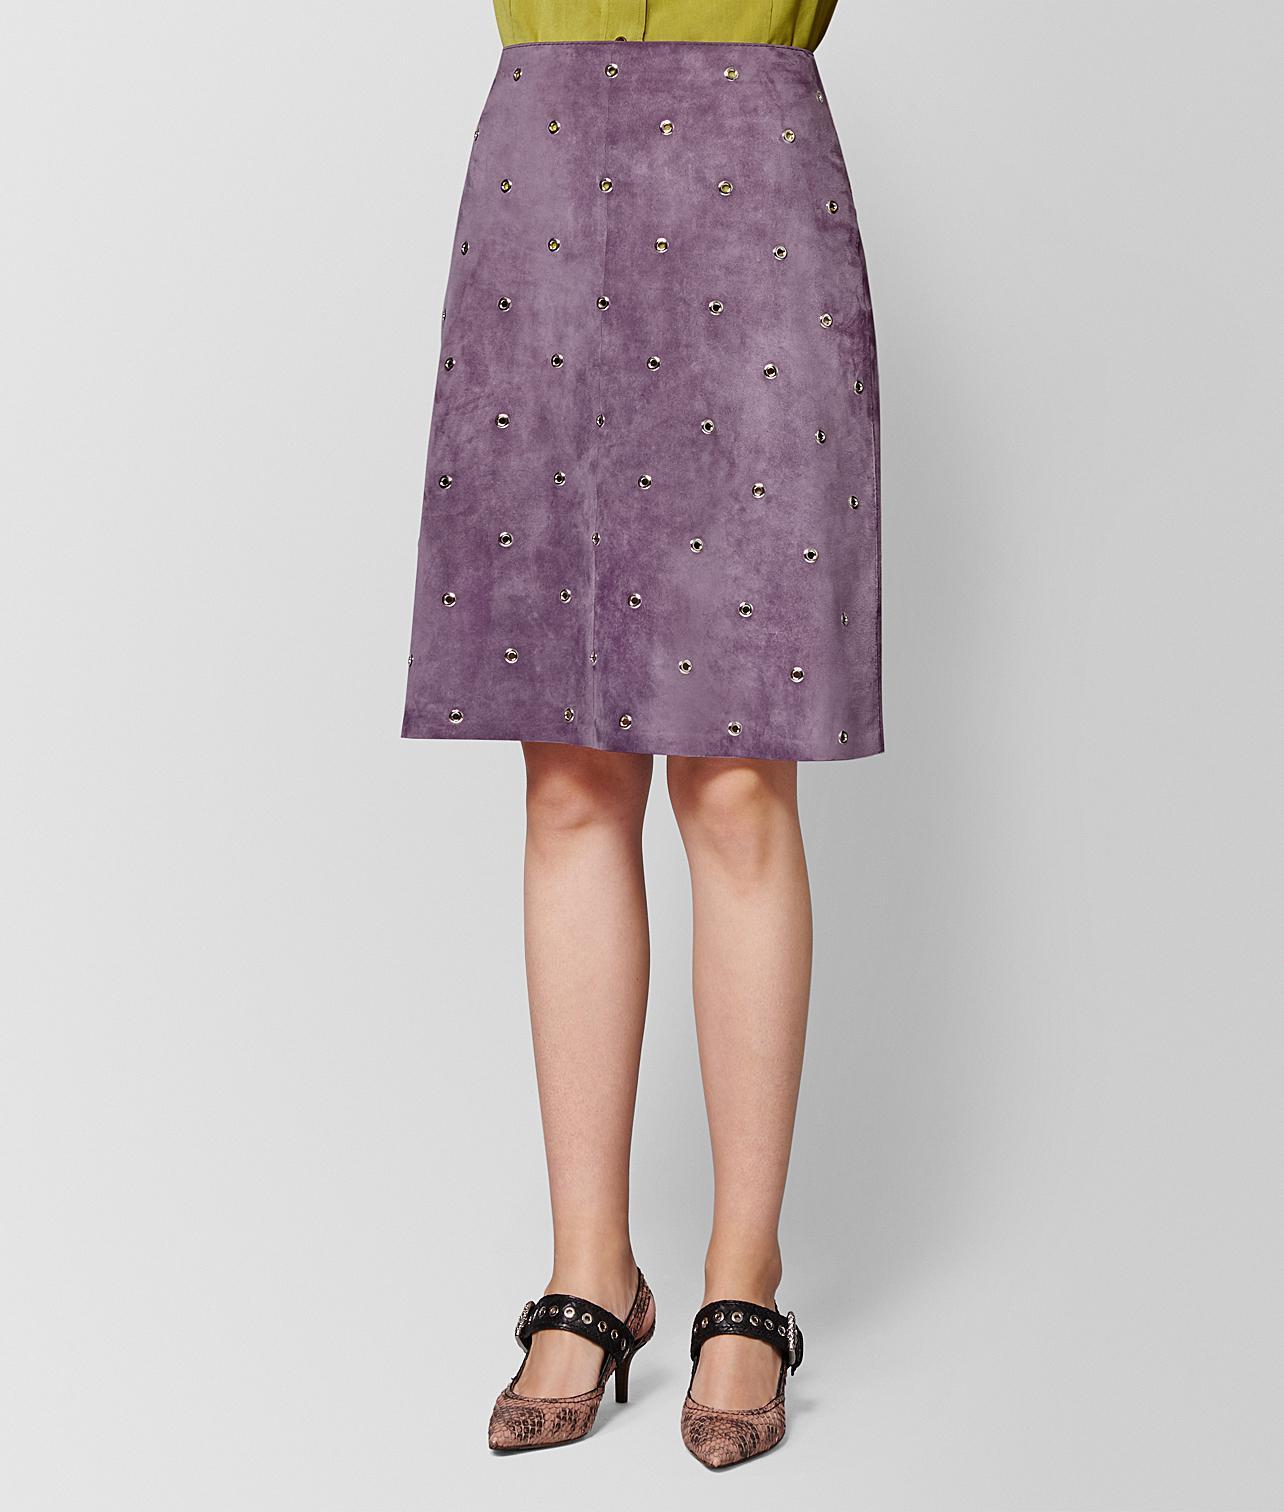 50b6f4752c Bottega Veneta Lilac Suede Skirt in Purple - Lyst